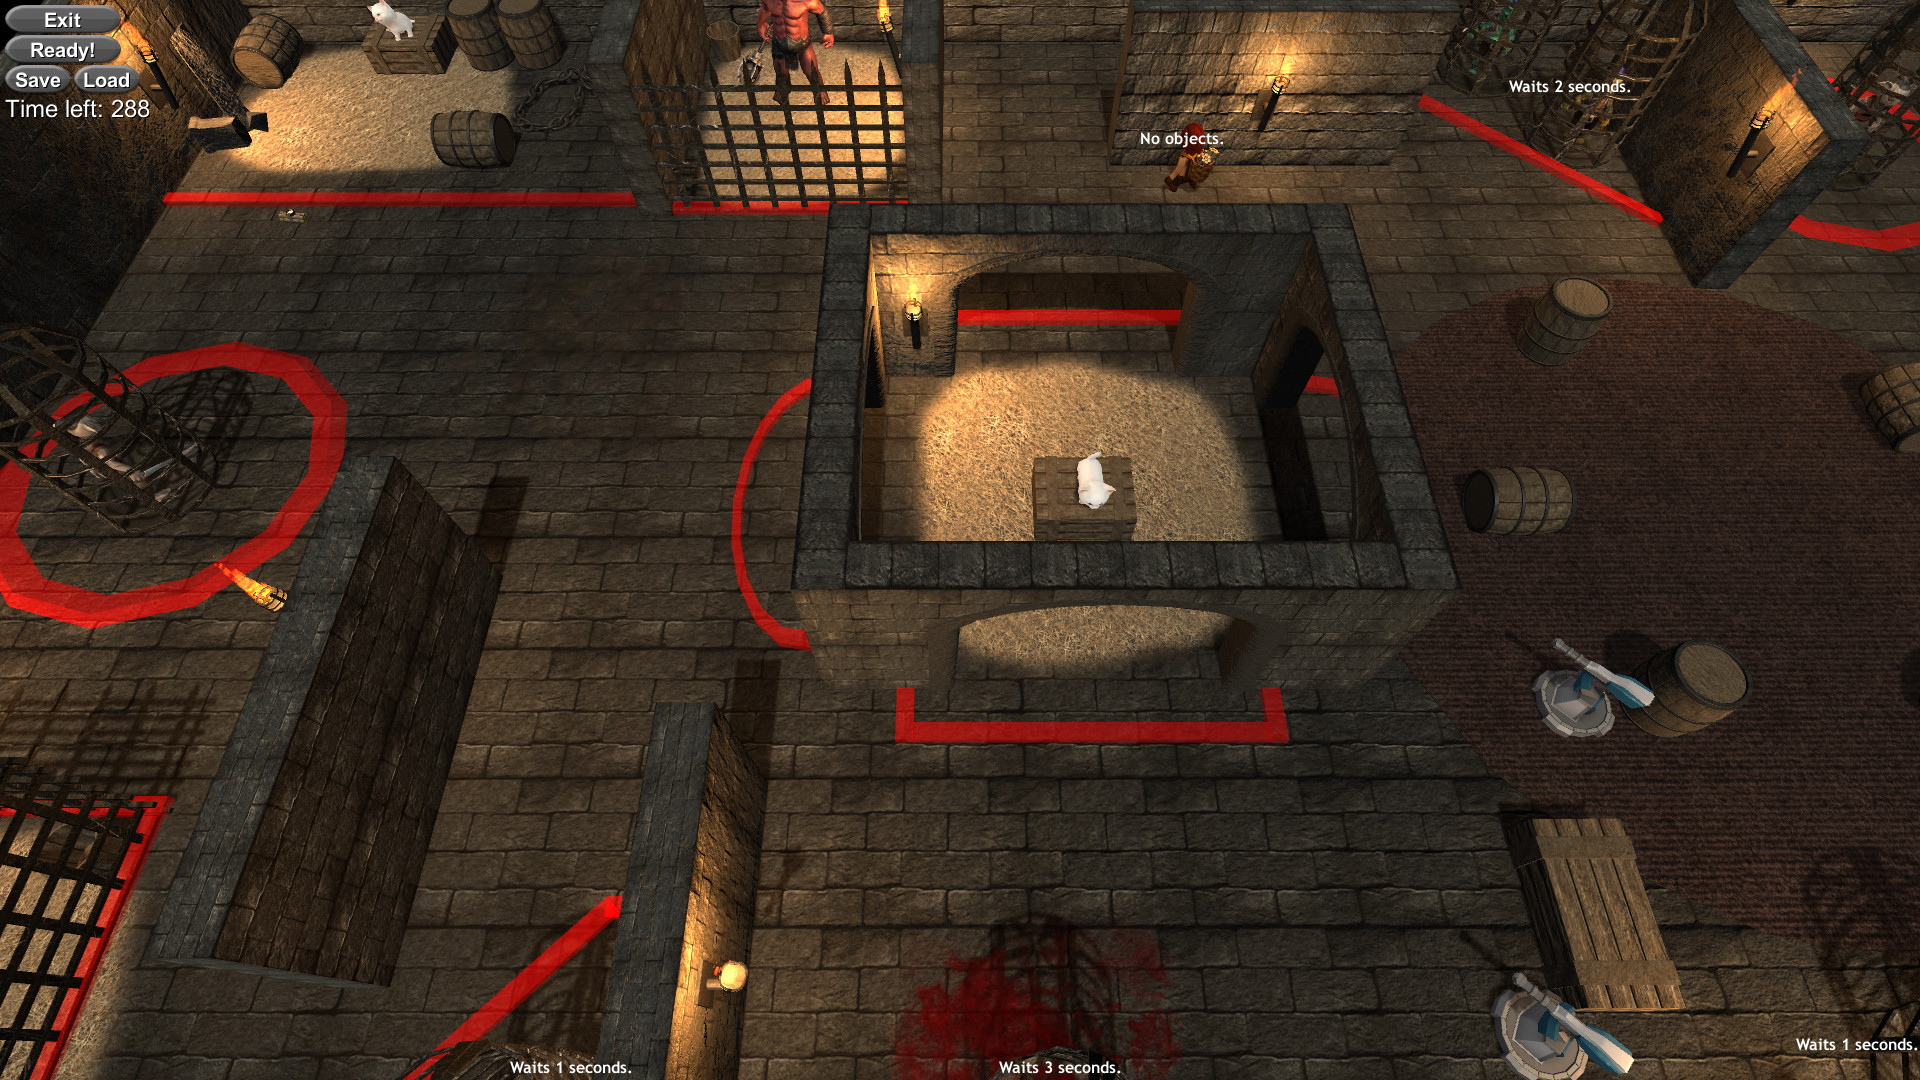 Bomb defense scene games bomb defense gameplay altavistaventures Image collections